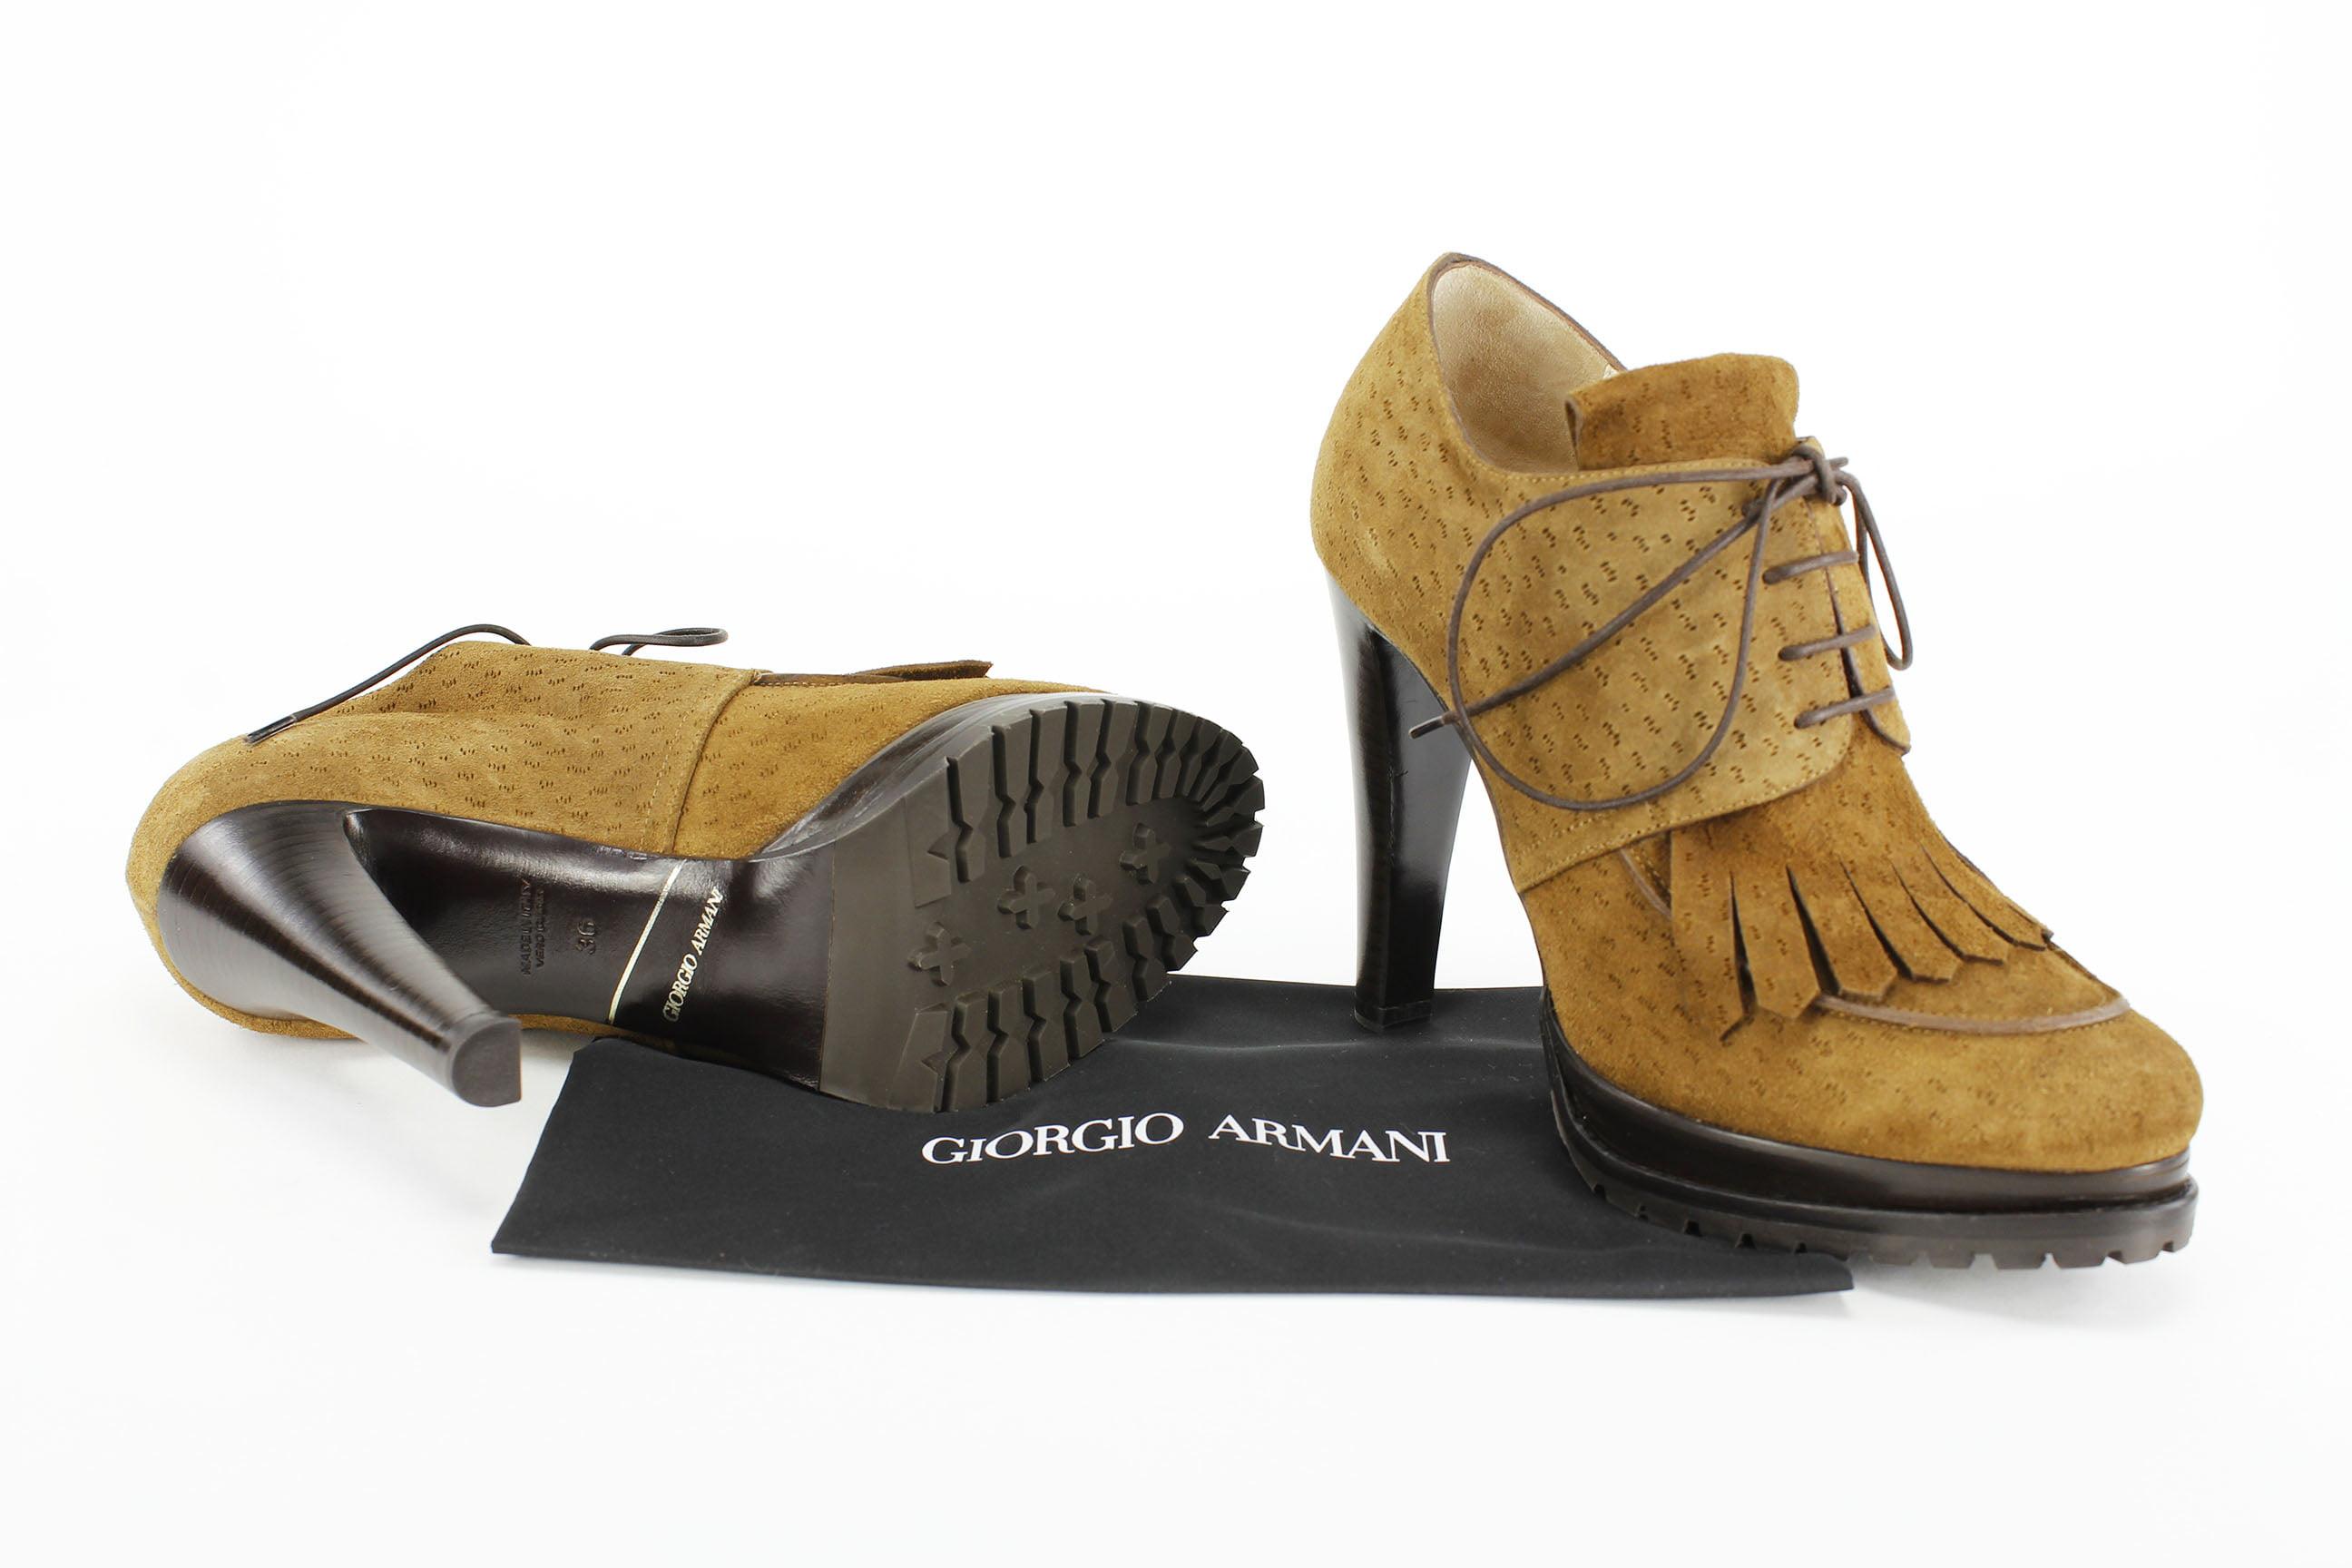 Giorgio Armani Womens Ankle Boots - Brown